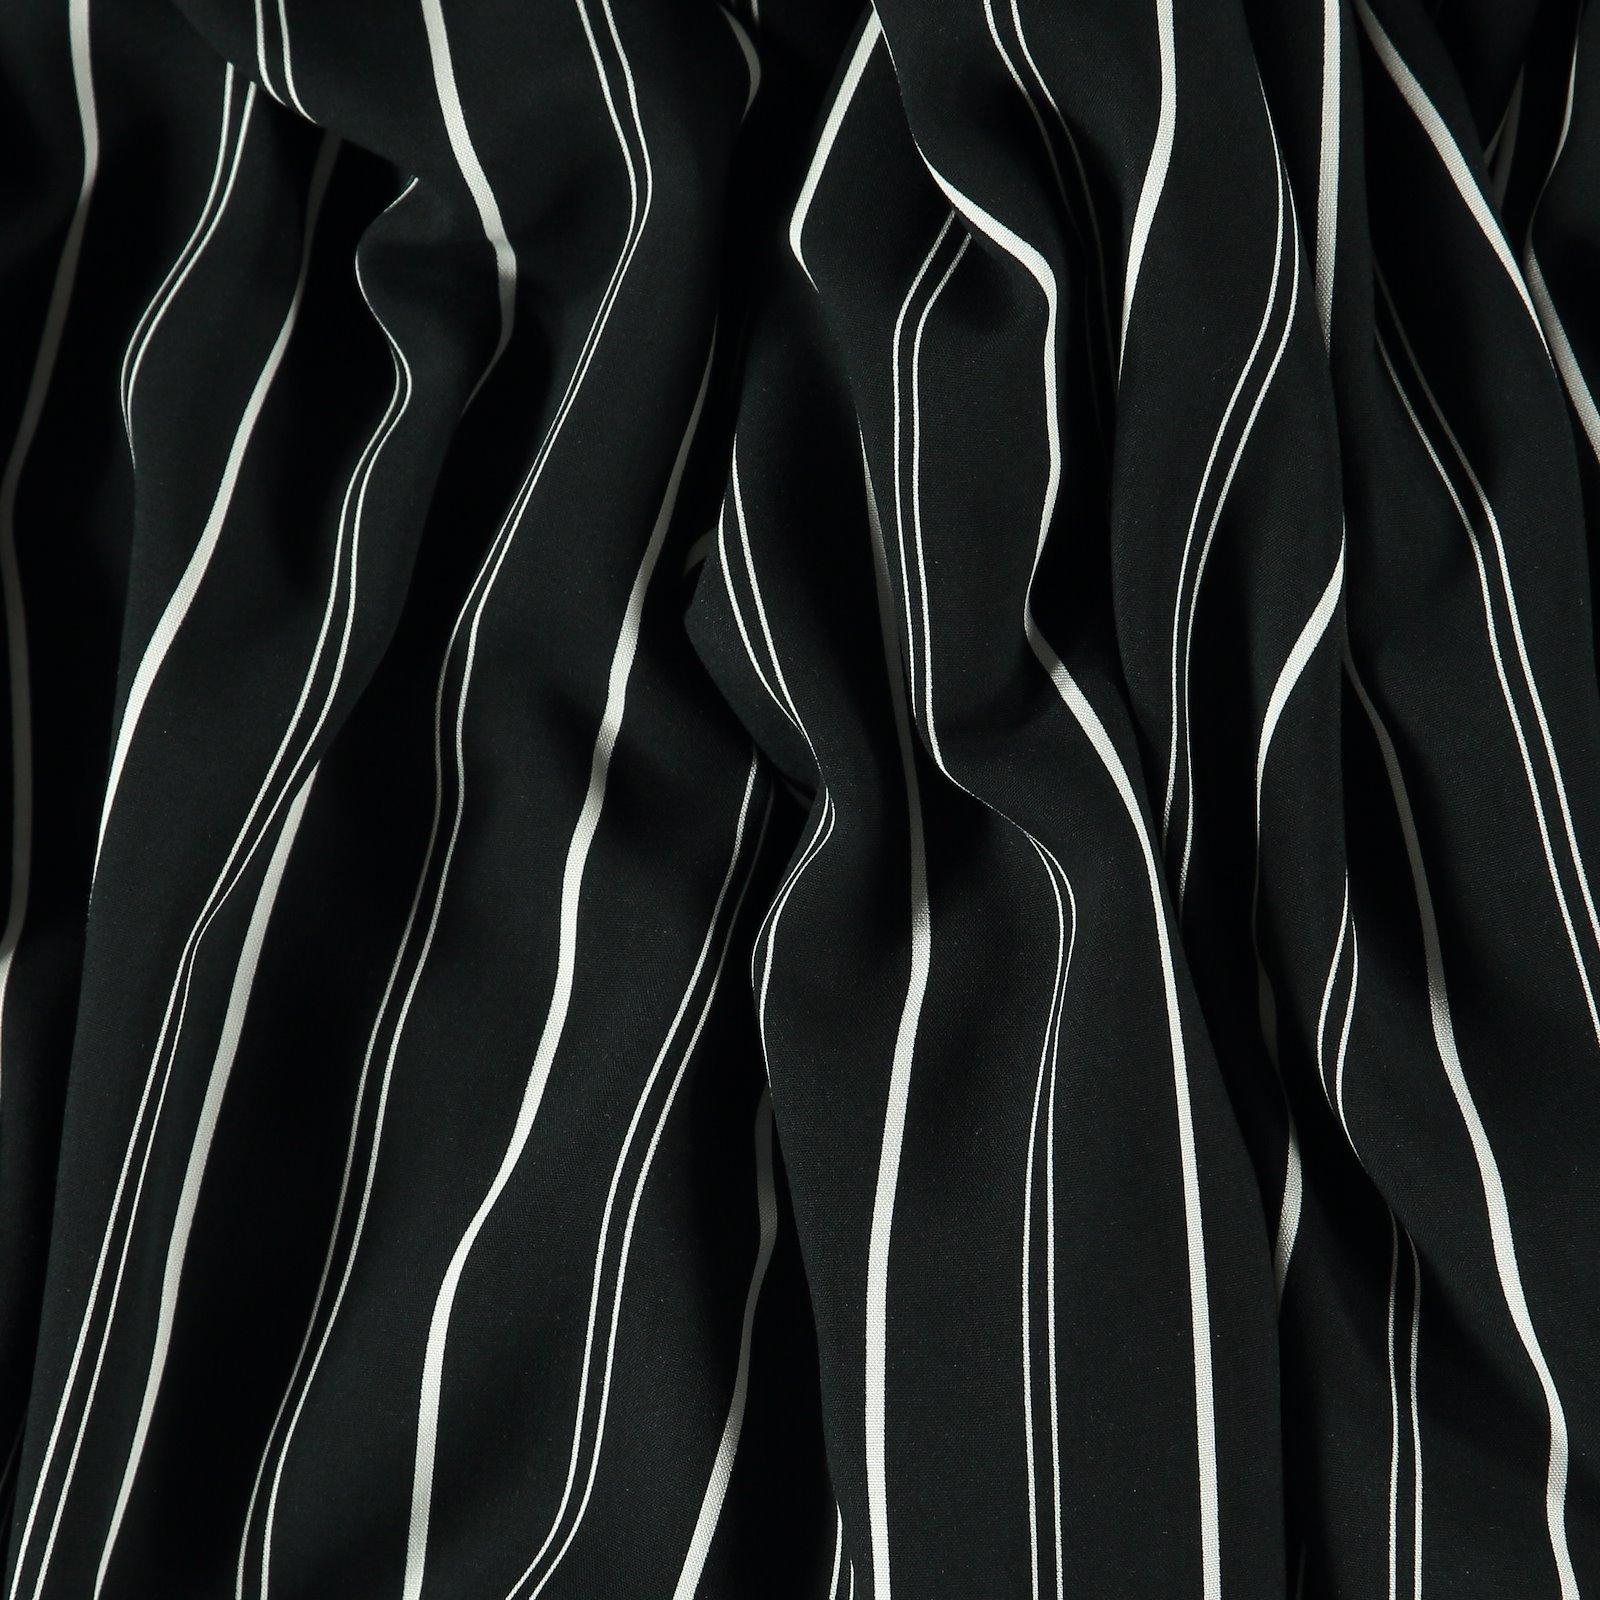 Woven viscose black with white stripes